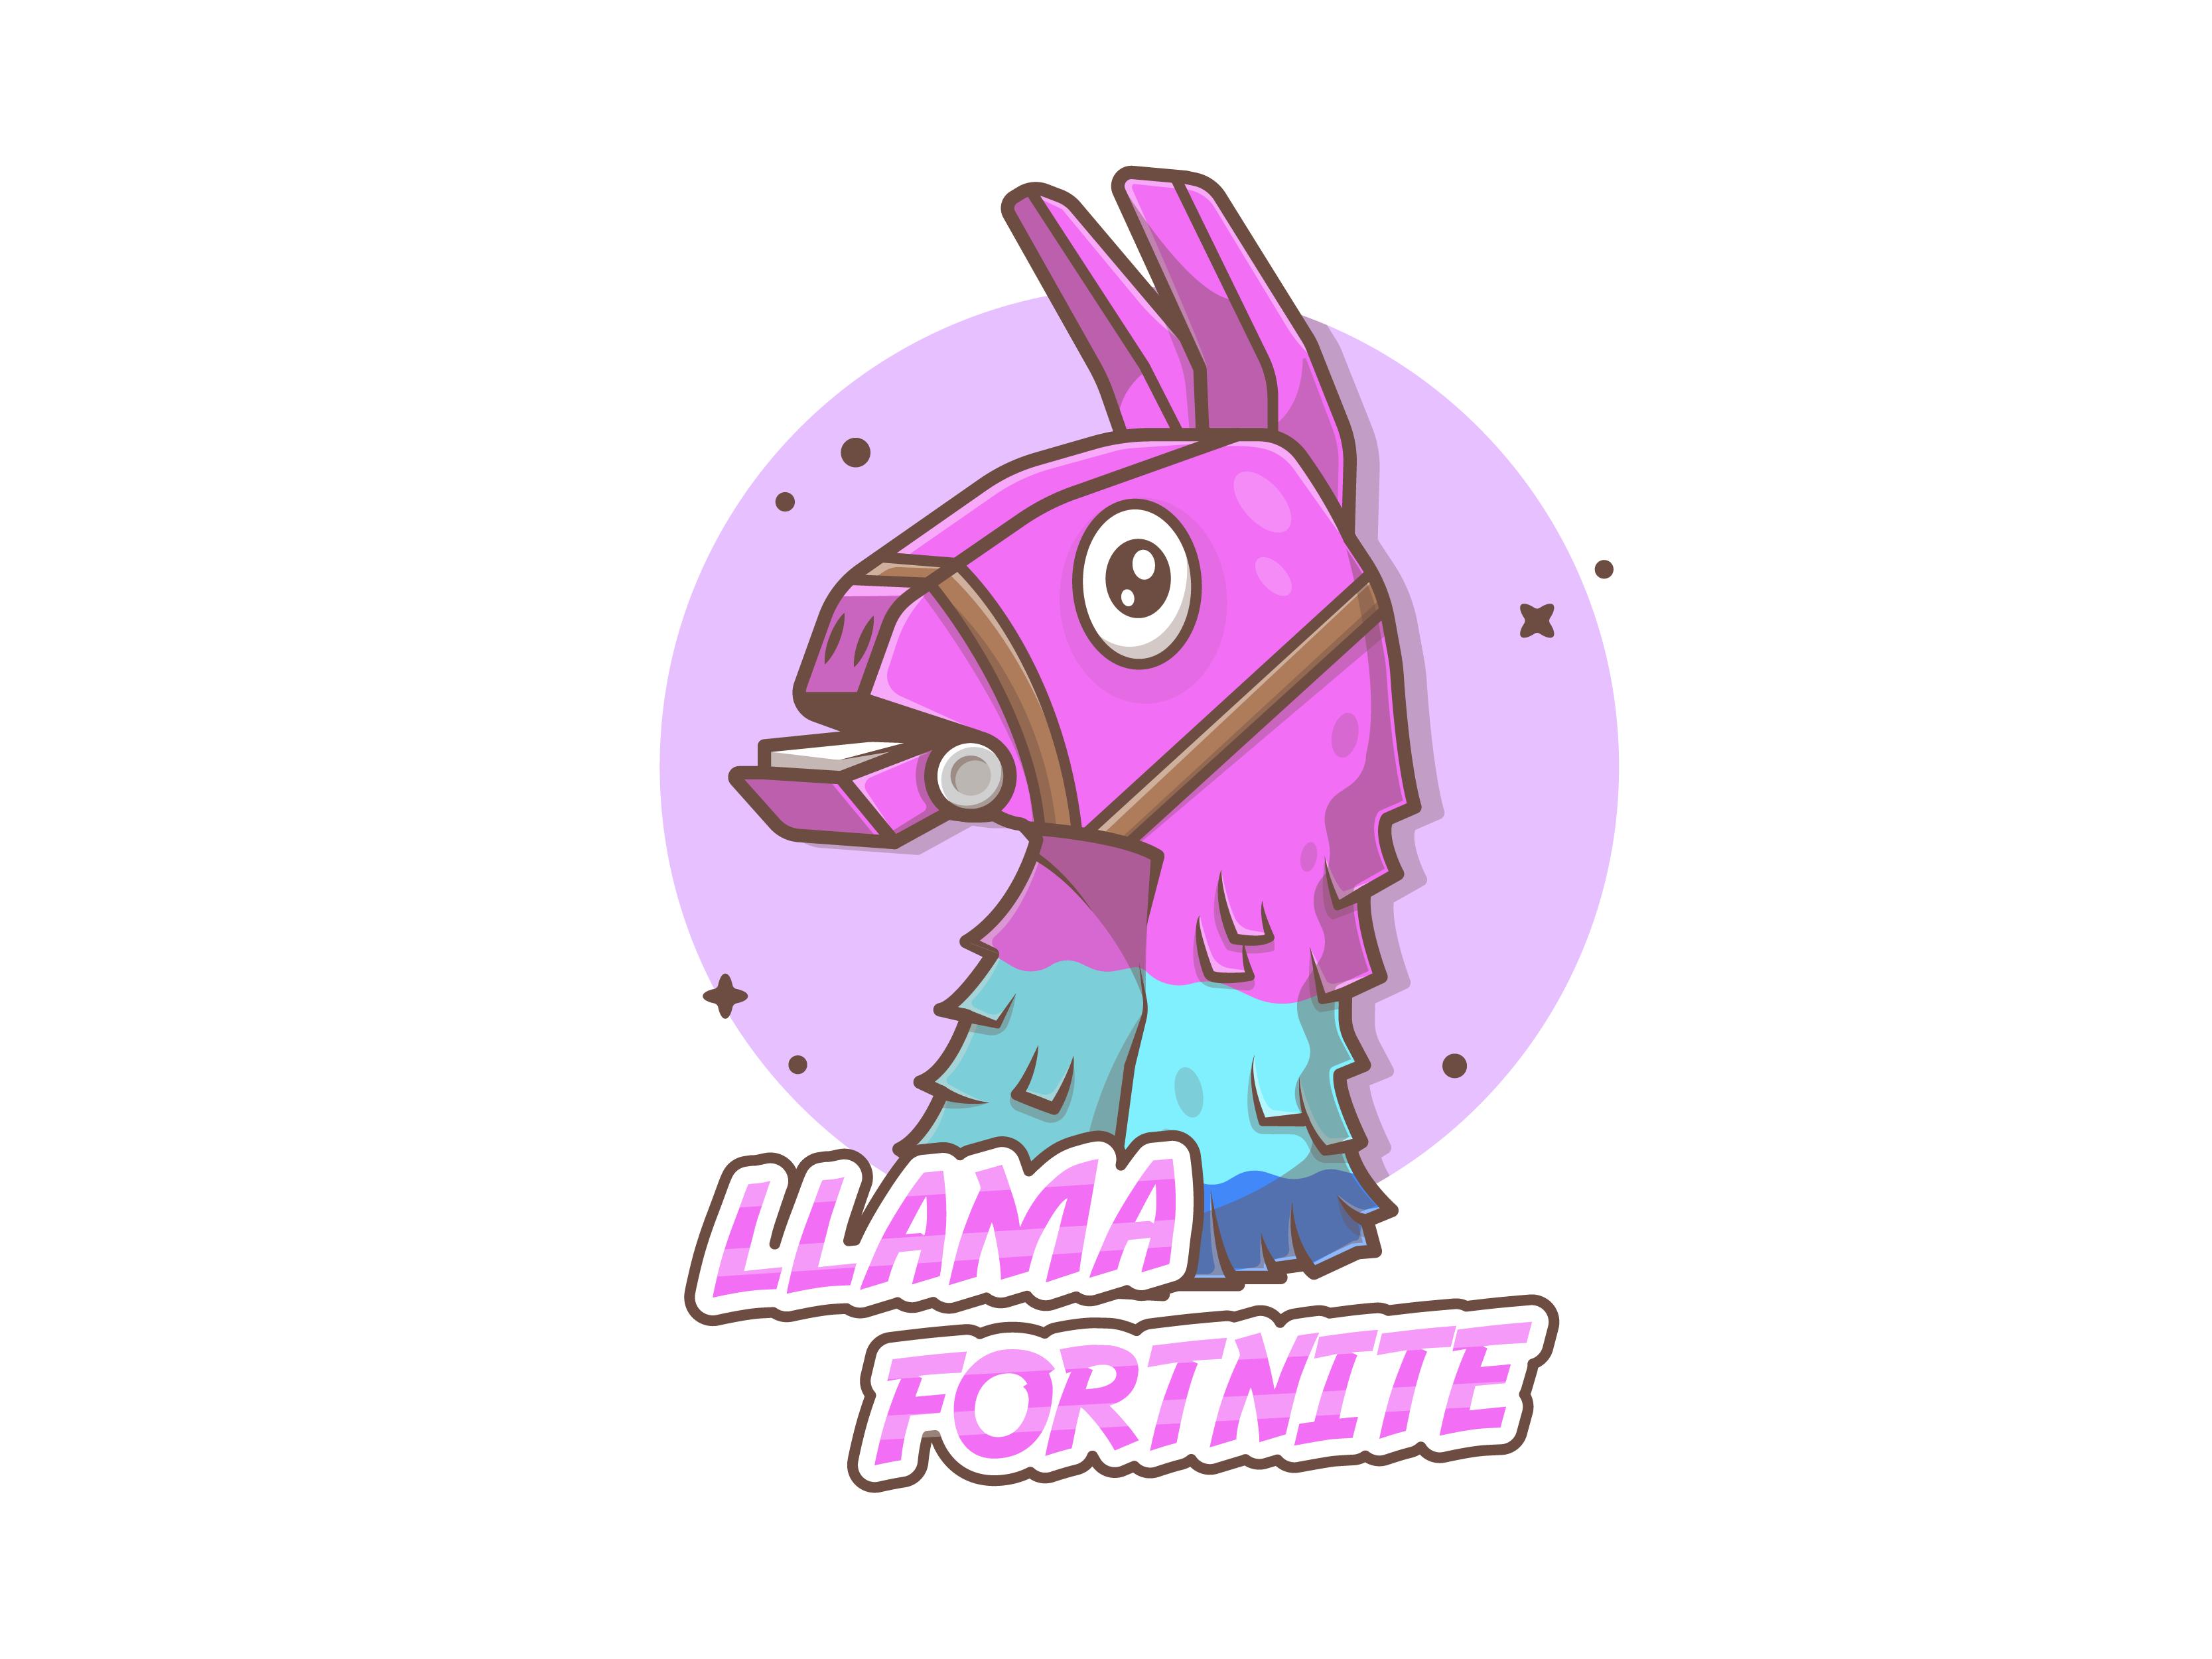 Fortnite Llama Png, Transparent PNG, png collections at dlf.pt.